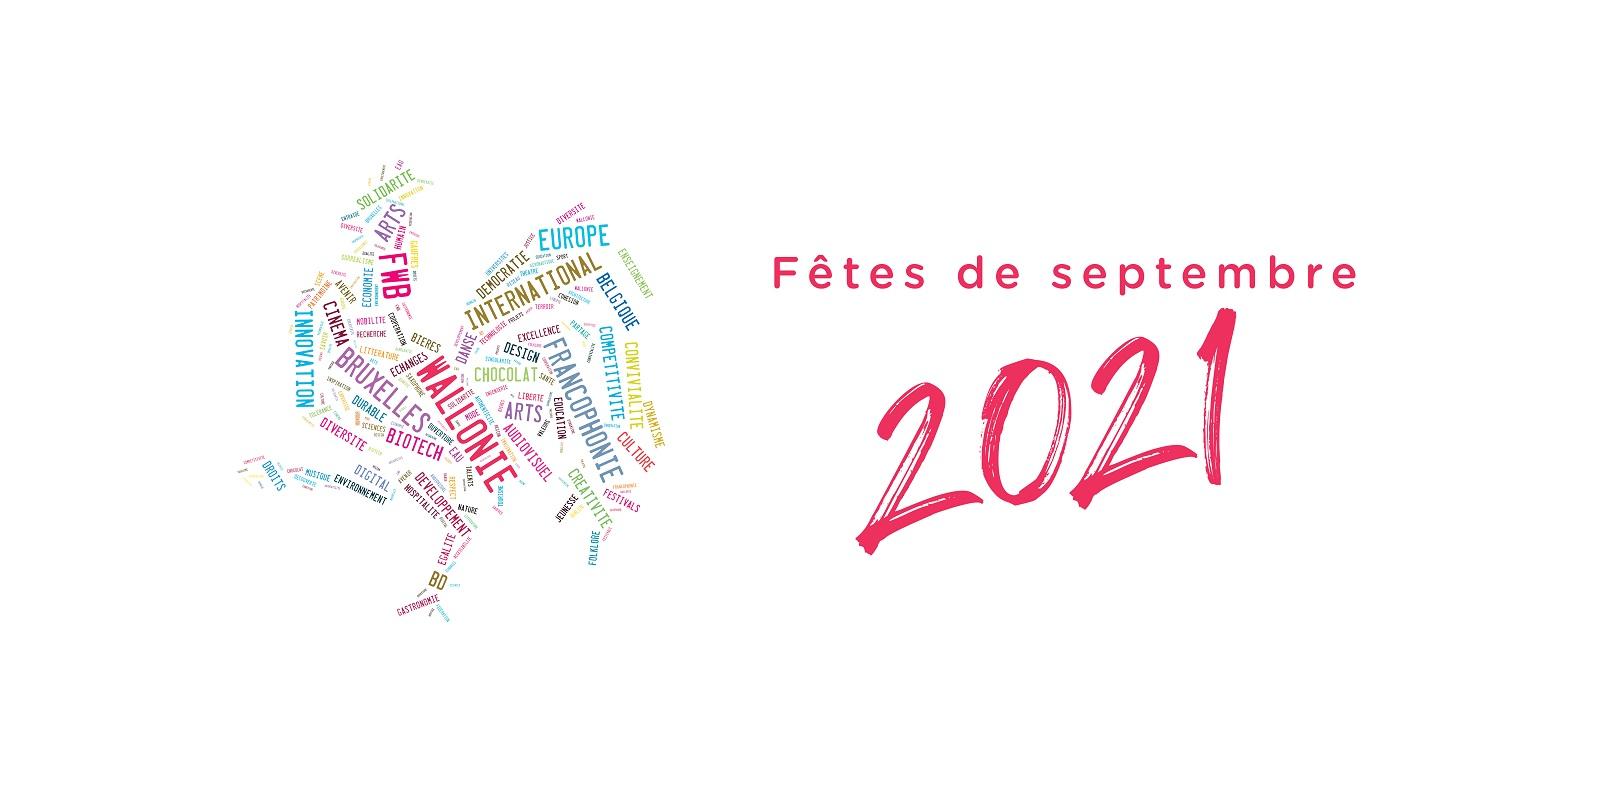 Fêtes de septembre 2021 | © J. Van Belle - WBI